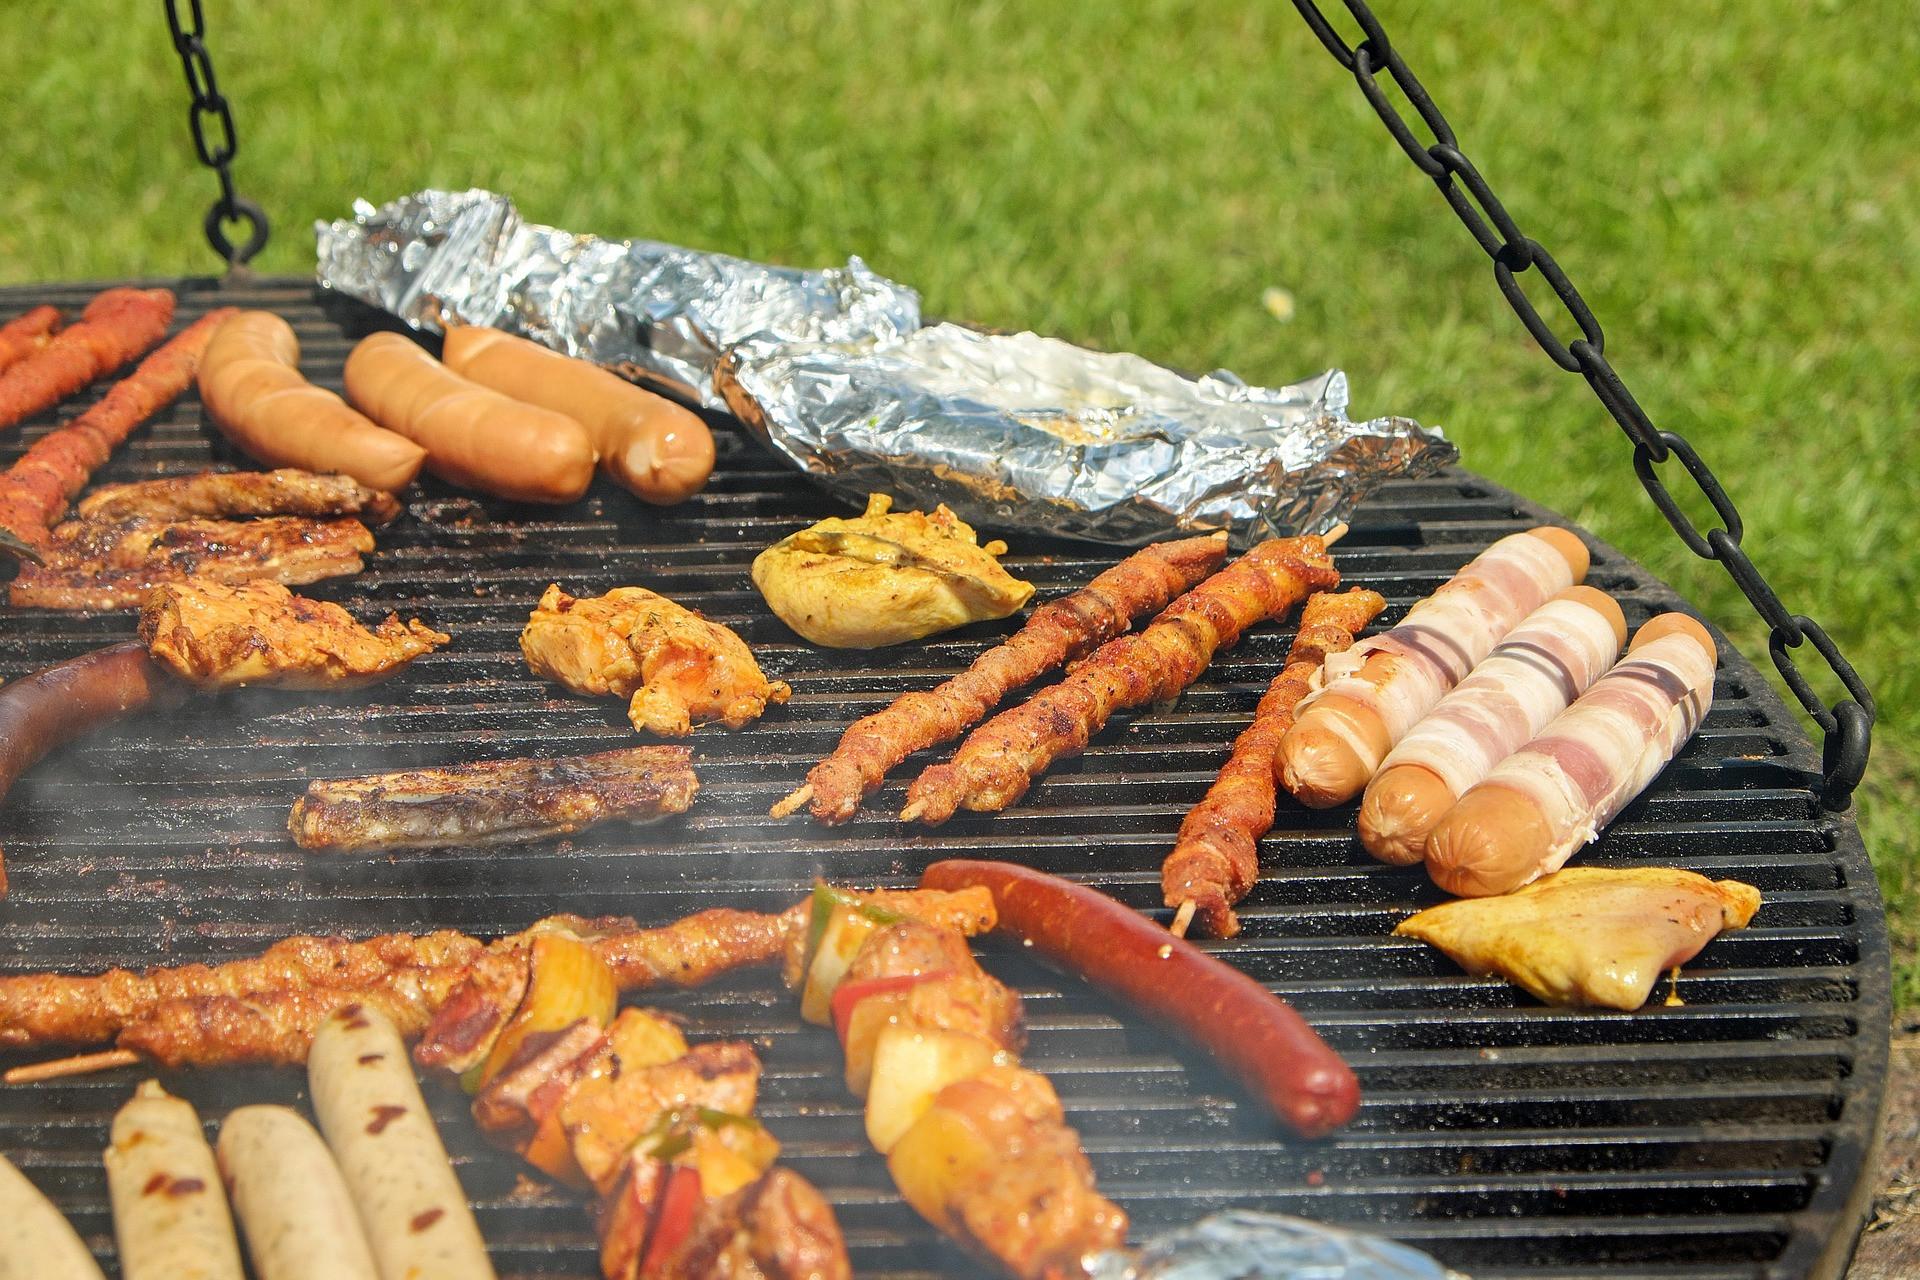 barbecue-1433018_1920.jpg